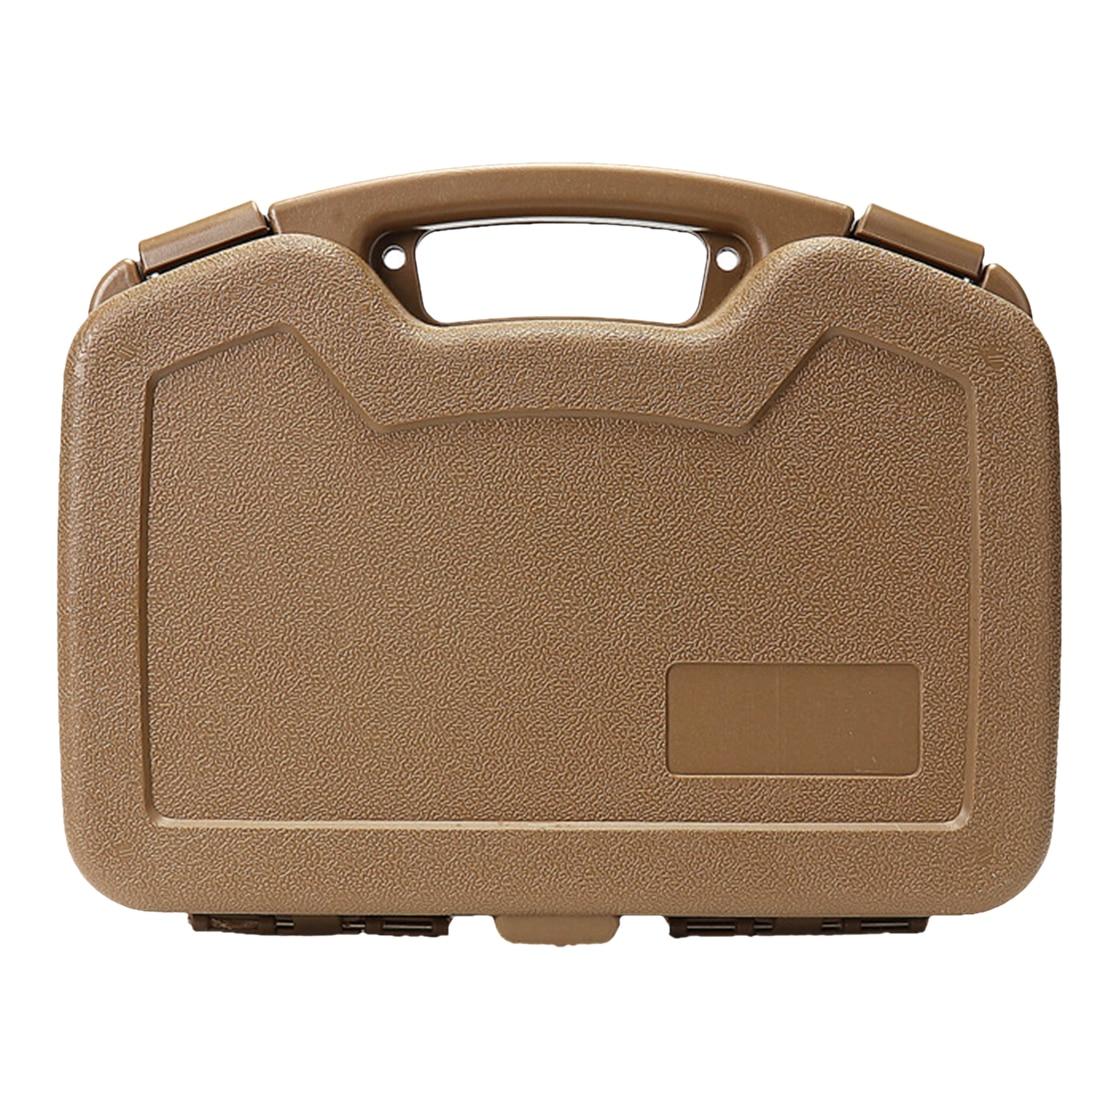 Portable Plastic Drop Resistance Protective Safety Box Storage Case for Glock G18 Mini Water Gel Beads Blaster - Khaki/Black стоимость